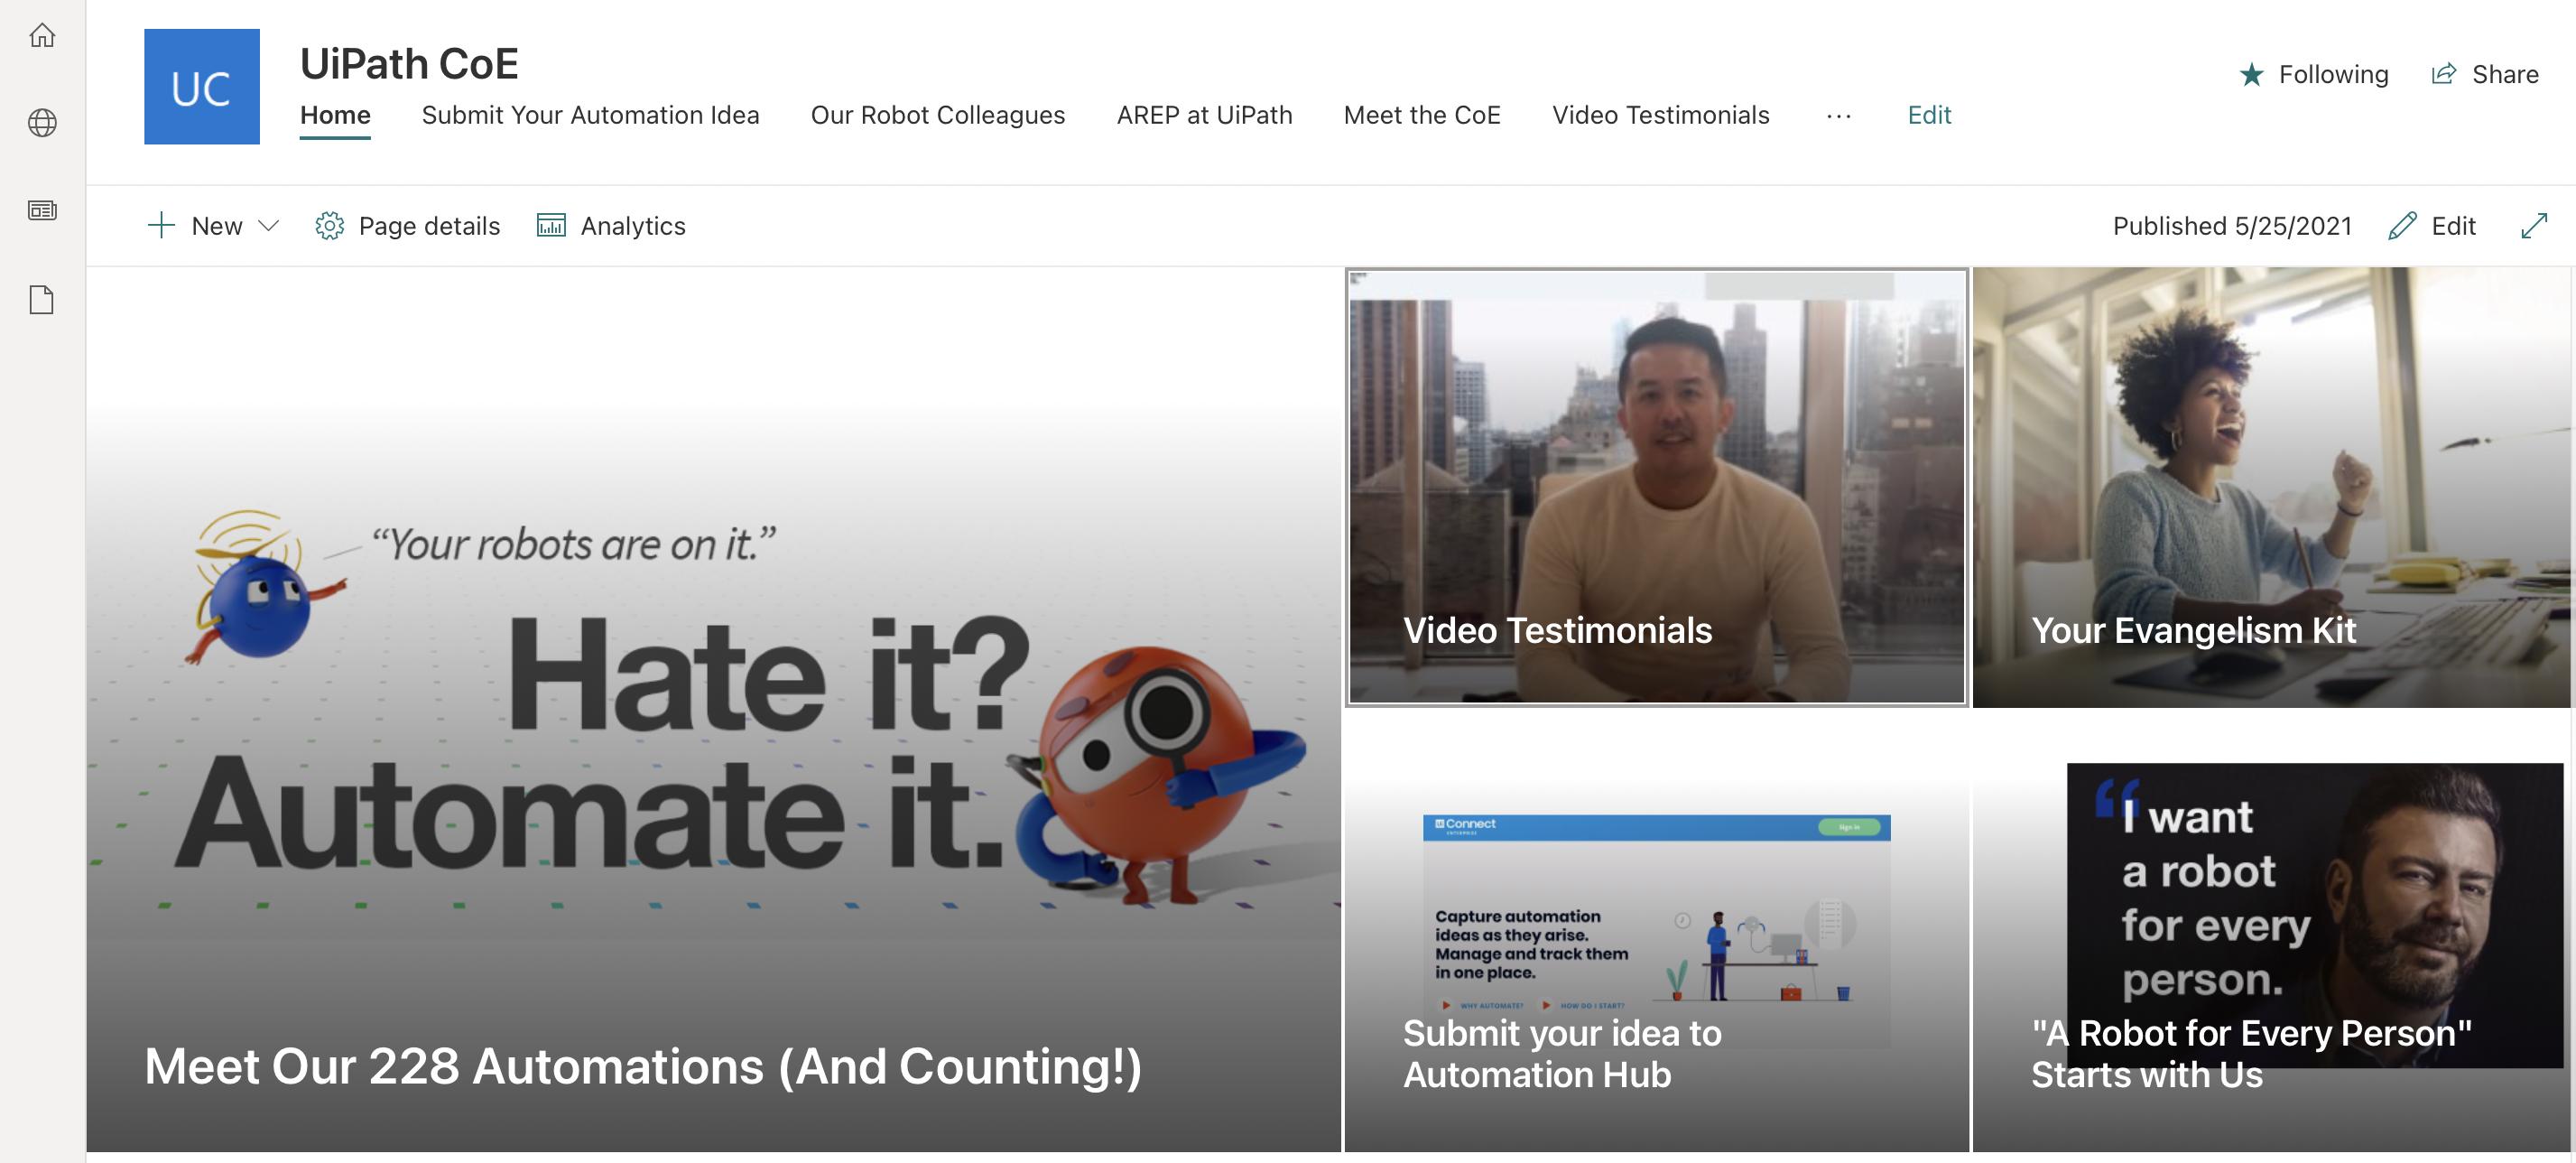 uipath-automation-coe-intranet